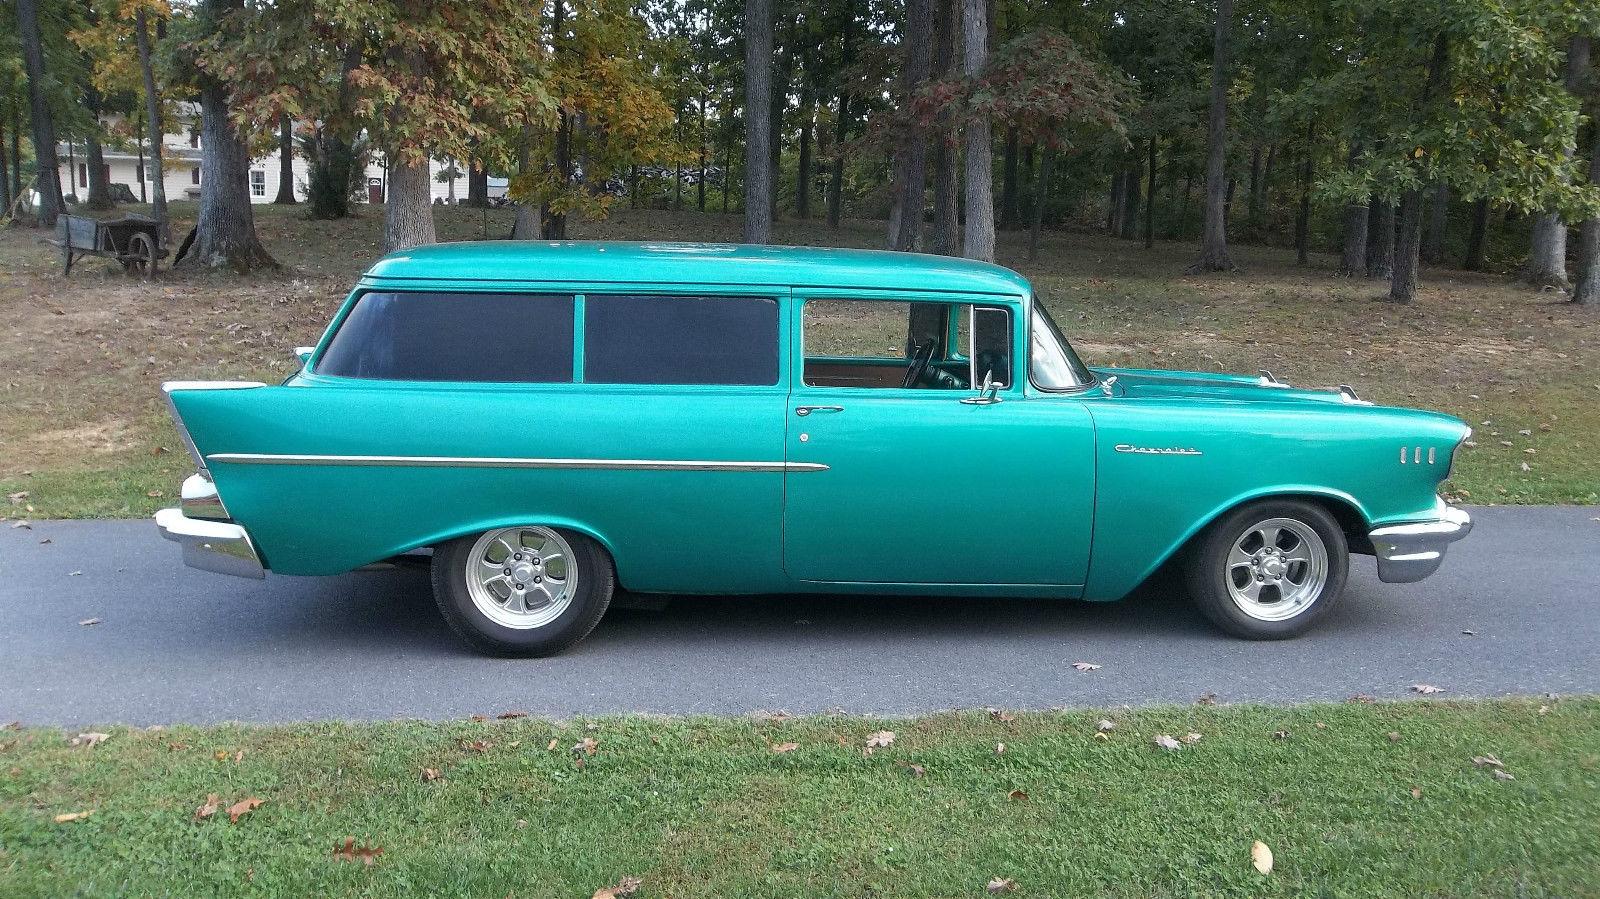 1957 Chevy 2 Door Handyman Wagon Rare 350 Auto Ultraleather Bel Air Interior Chevrolet 150 210